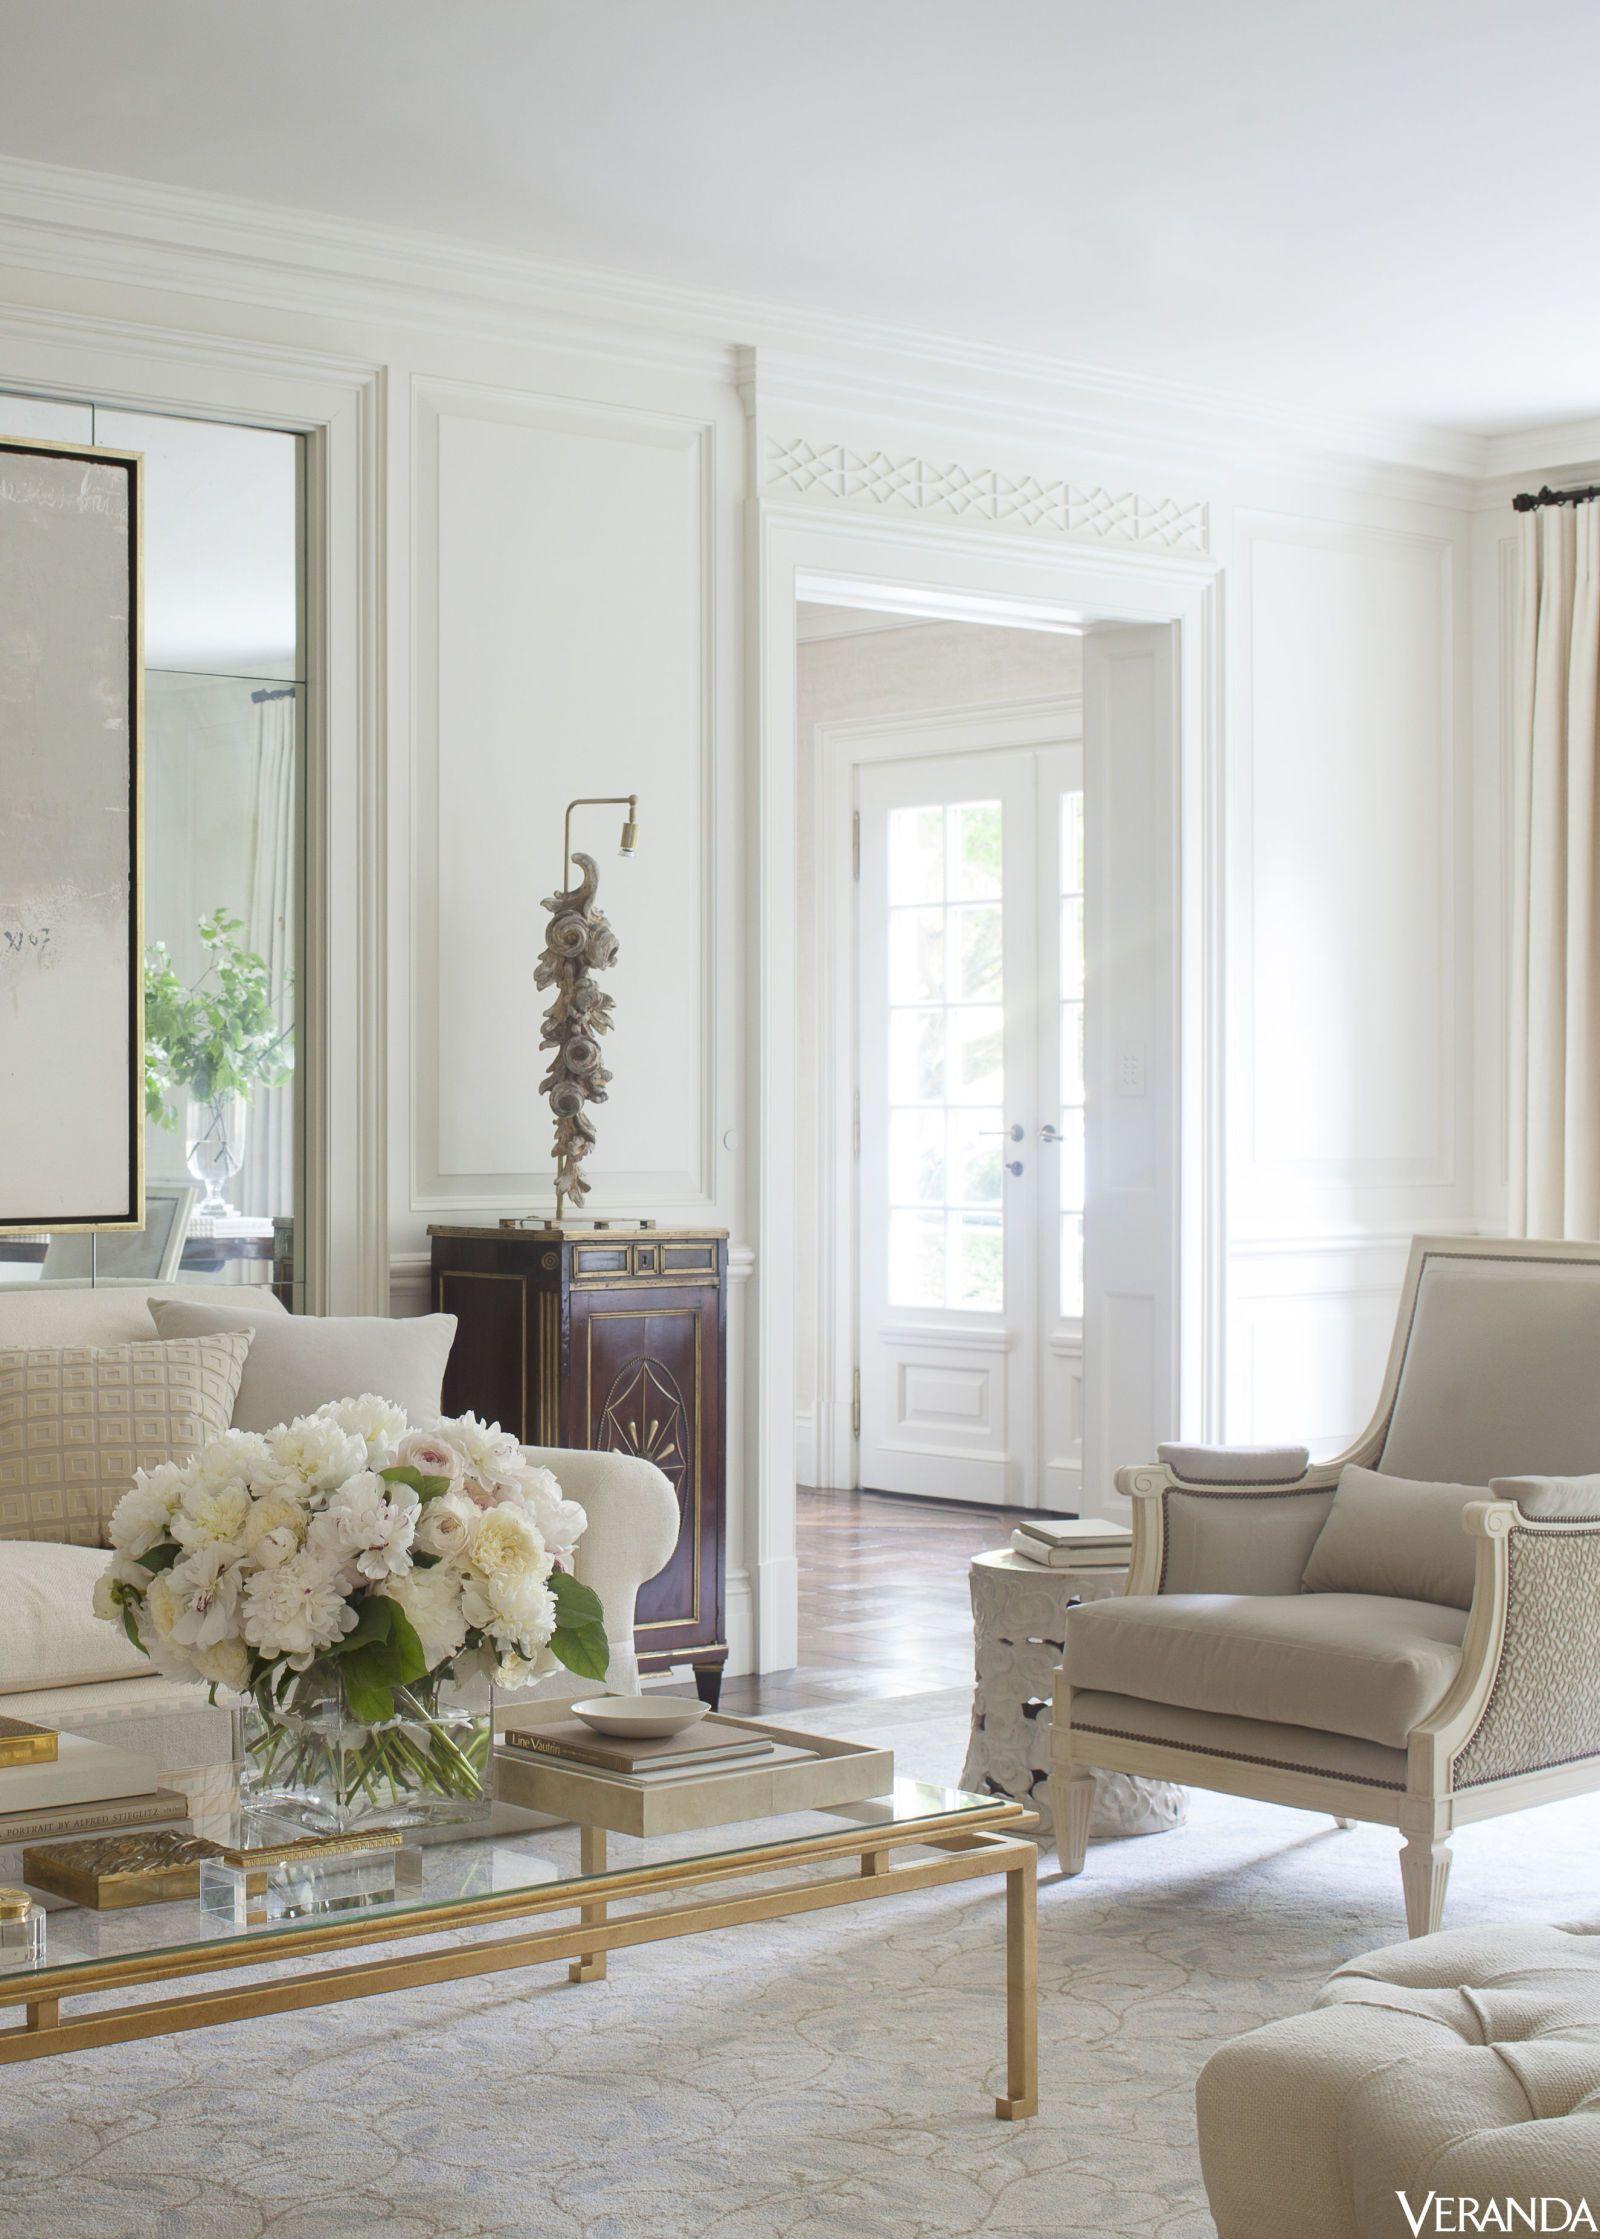 30 Summer Homes Perfect For A Weekend Getaway House Interior House Design Interior Design Living room ideas veranda